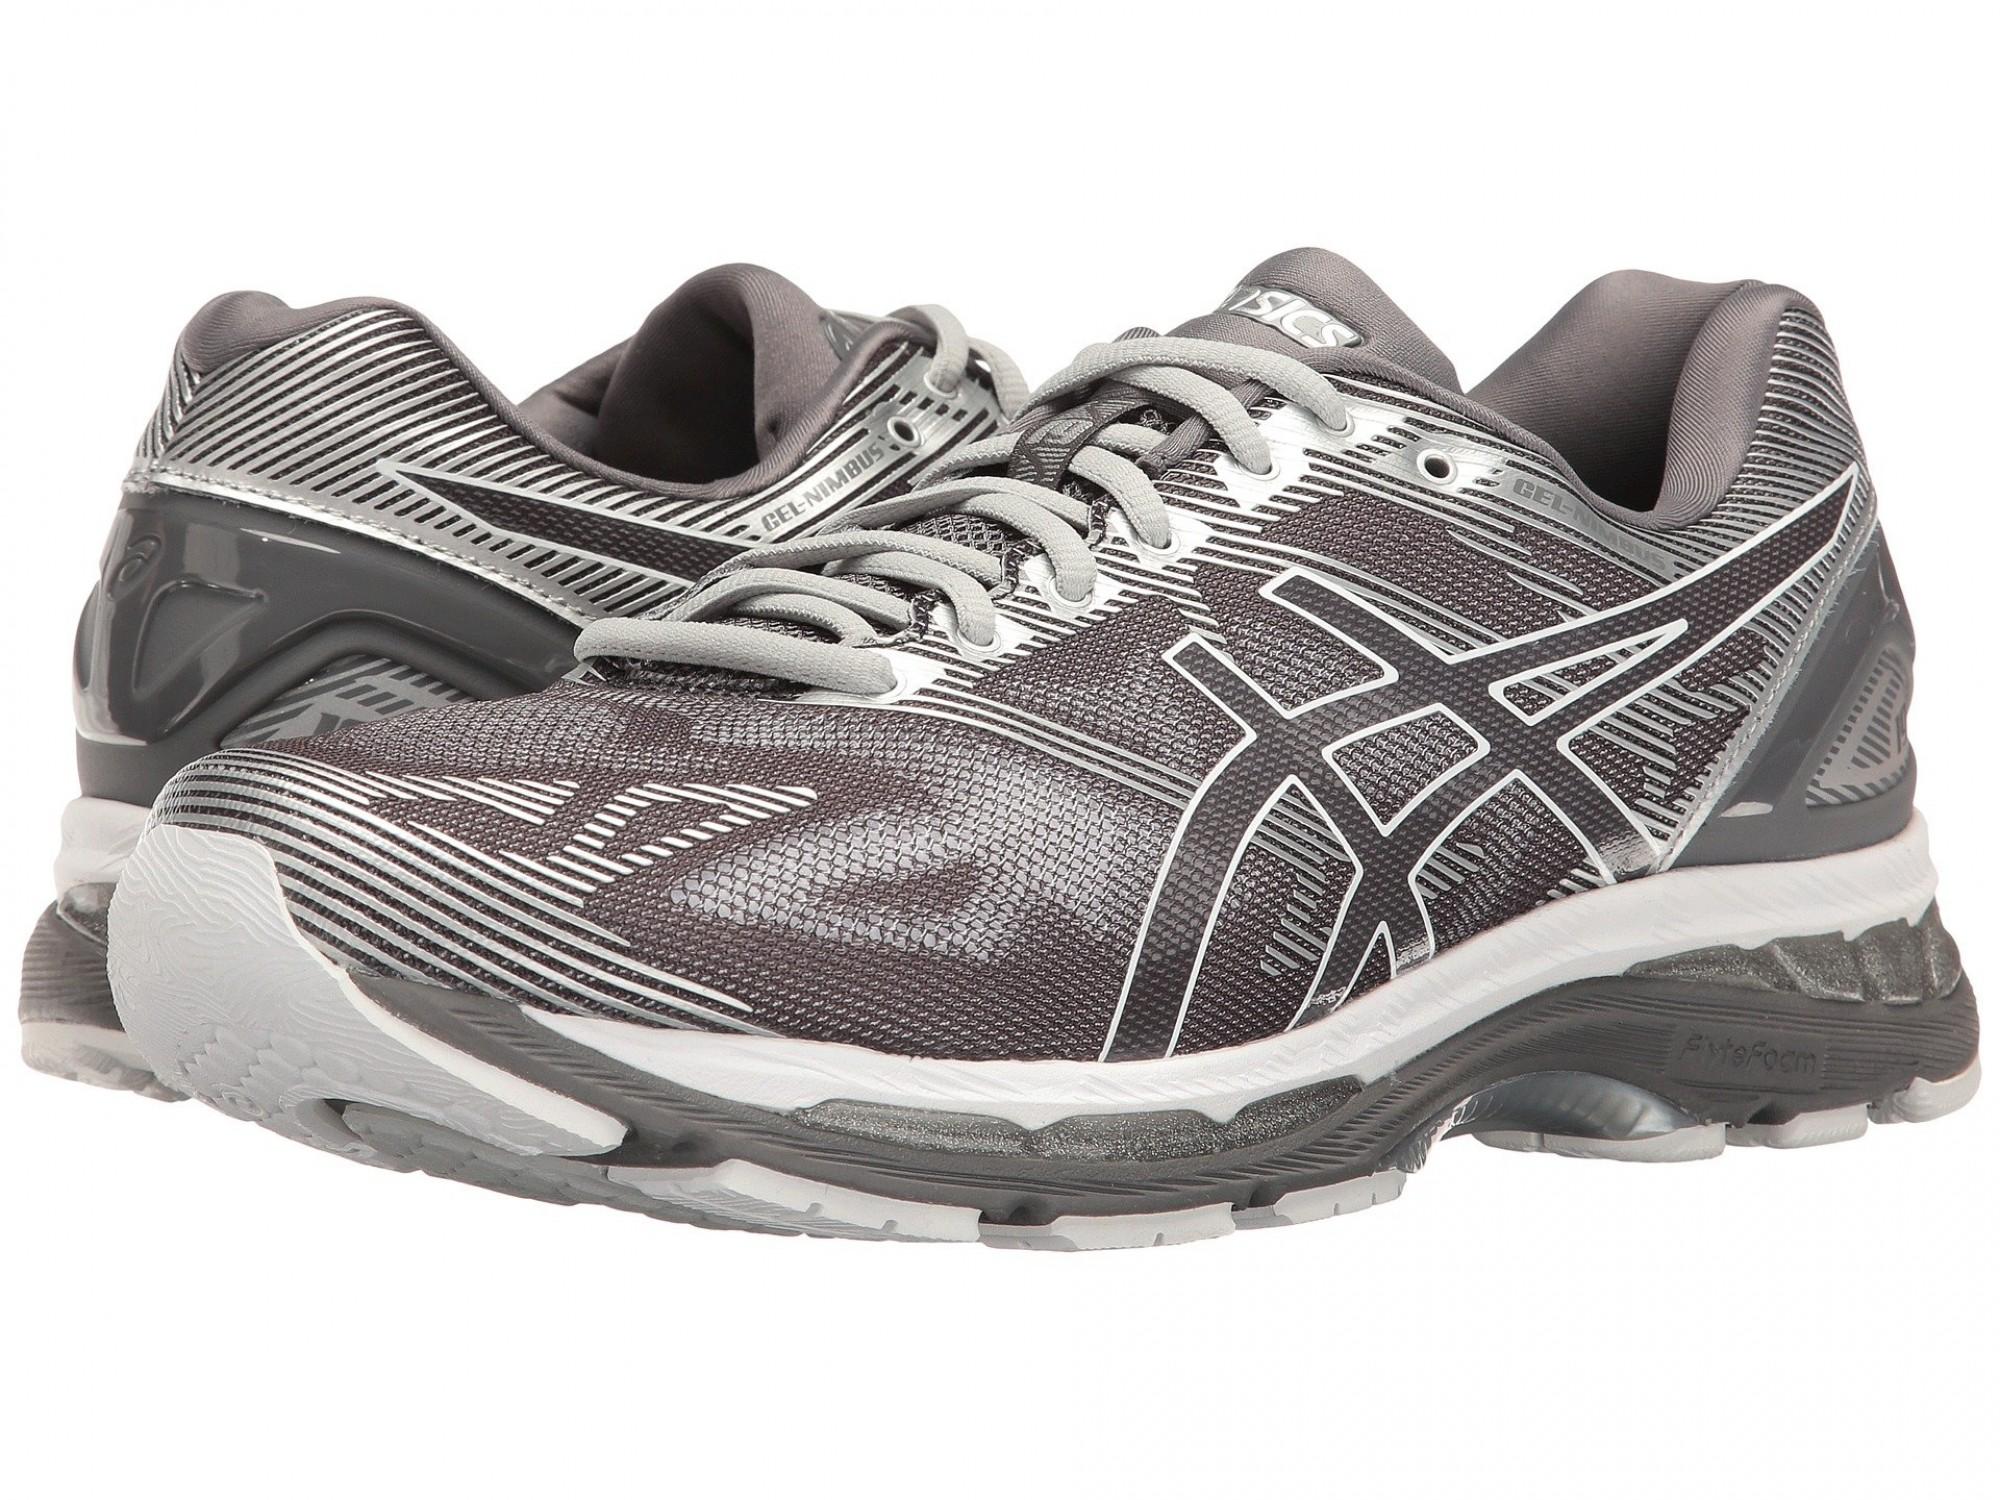 sports shoes a8b34 4c814 ASICS GEL-Nimbus 19 T700N 9701